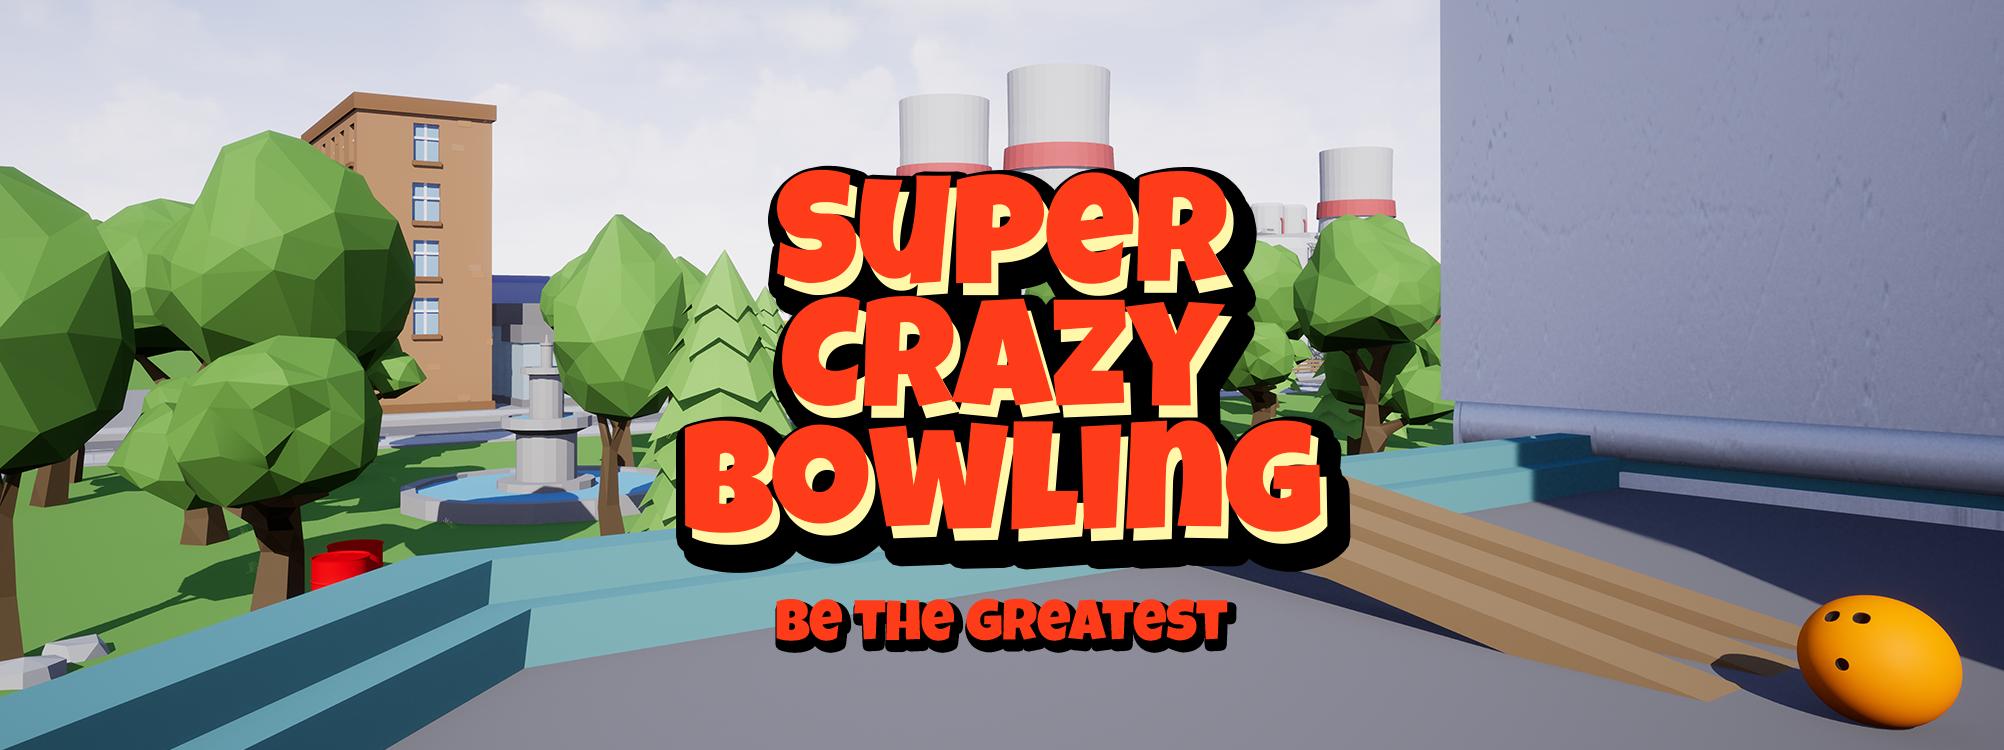 Super Crazy Bowling